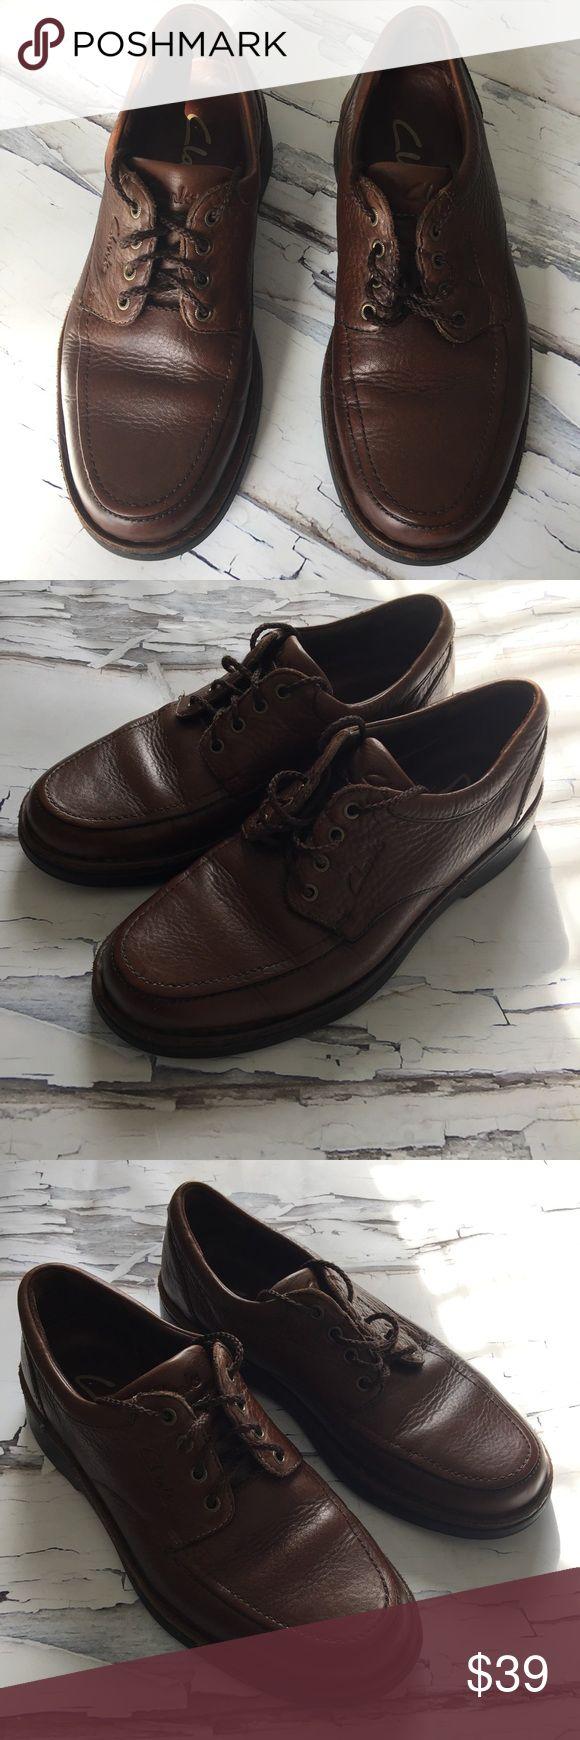 Men's CLARKS Brown Leather Lace Up Oxfords EUC Genuine leather. Medium width Clarks Shoes Oxfords & Derbys